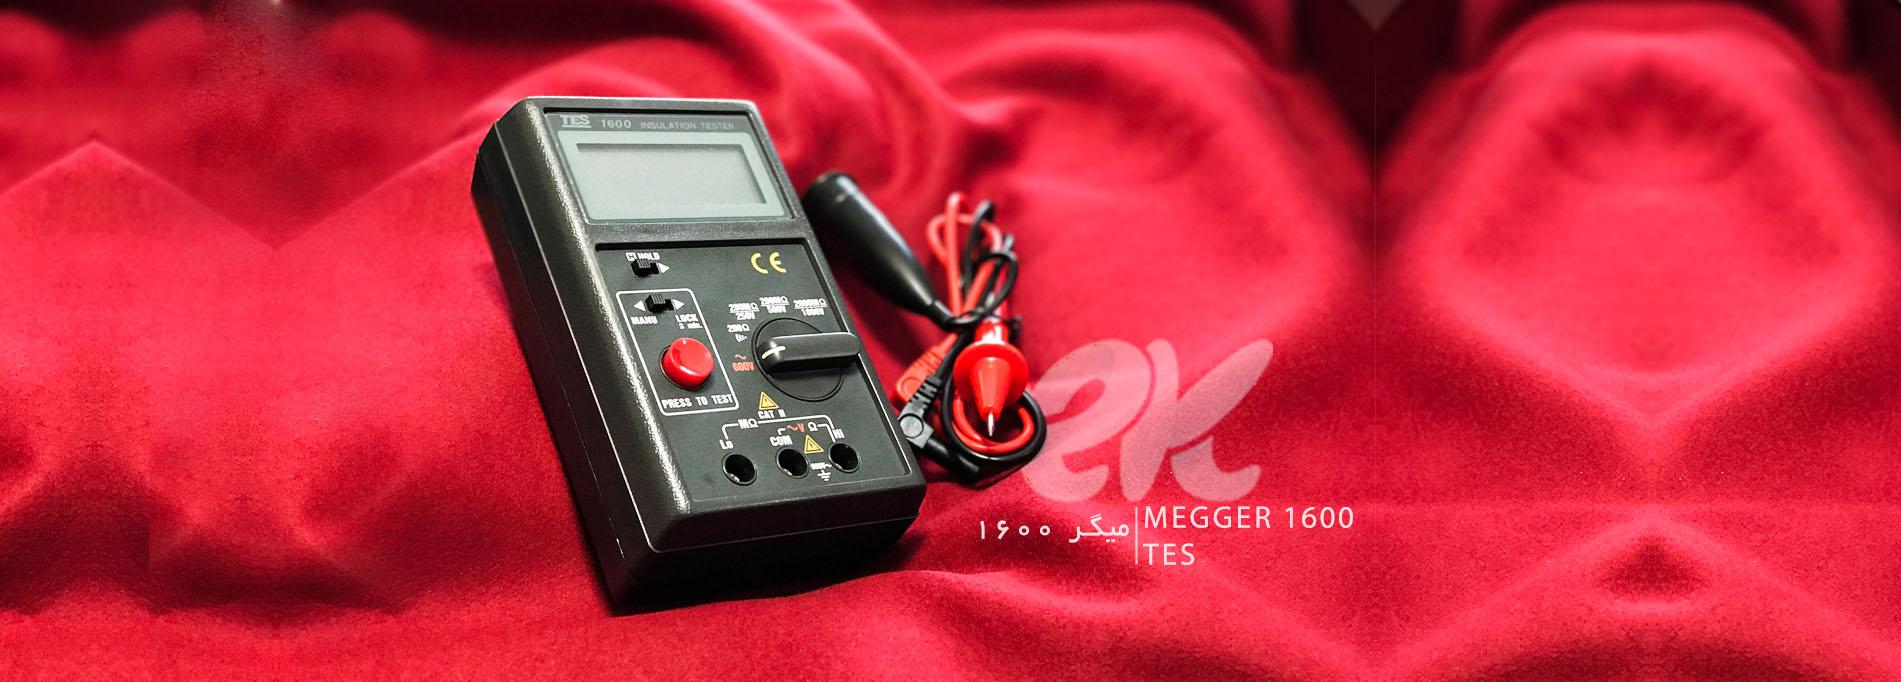 megger-tes-1600